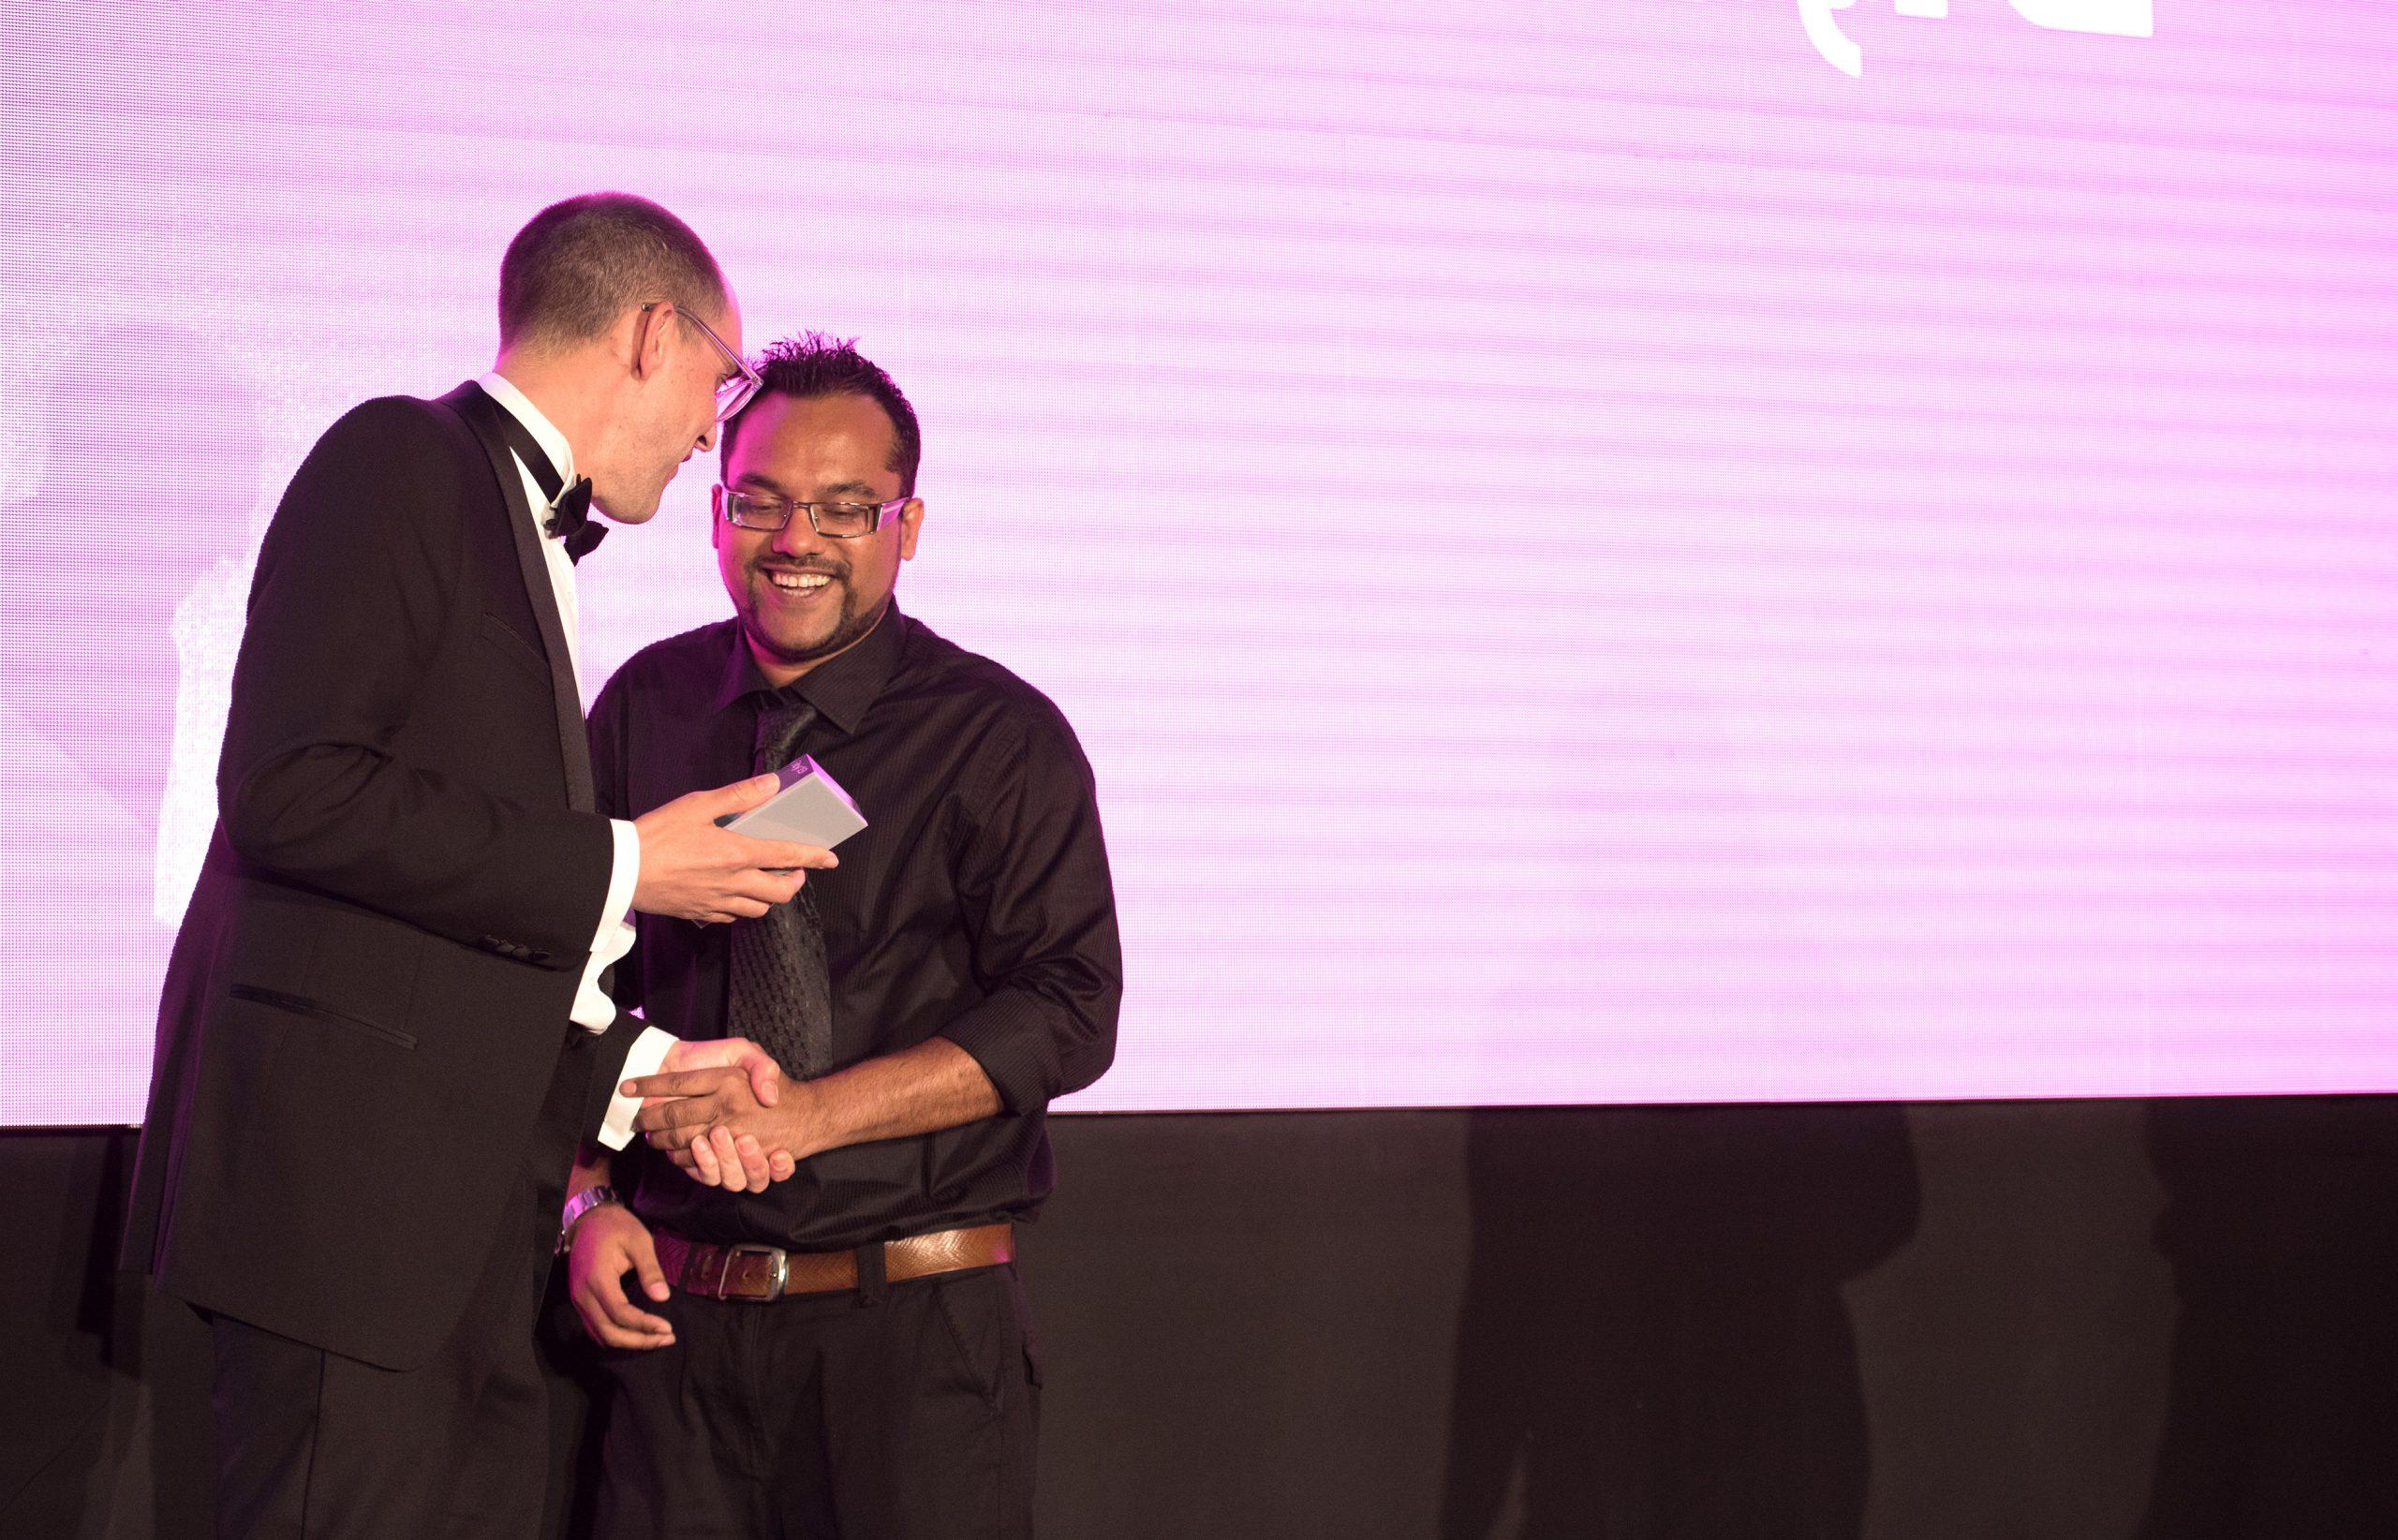 ingenuity partner shaking hands with prize winner